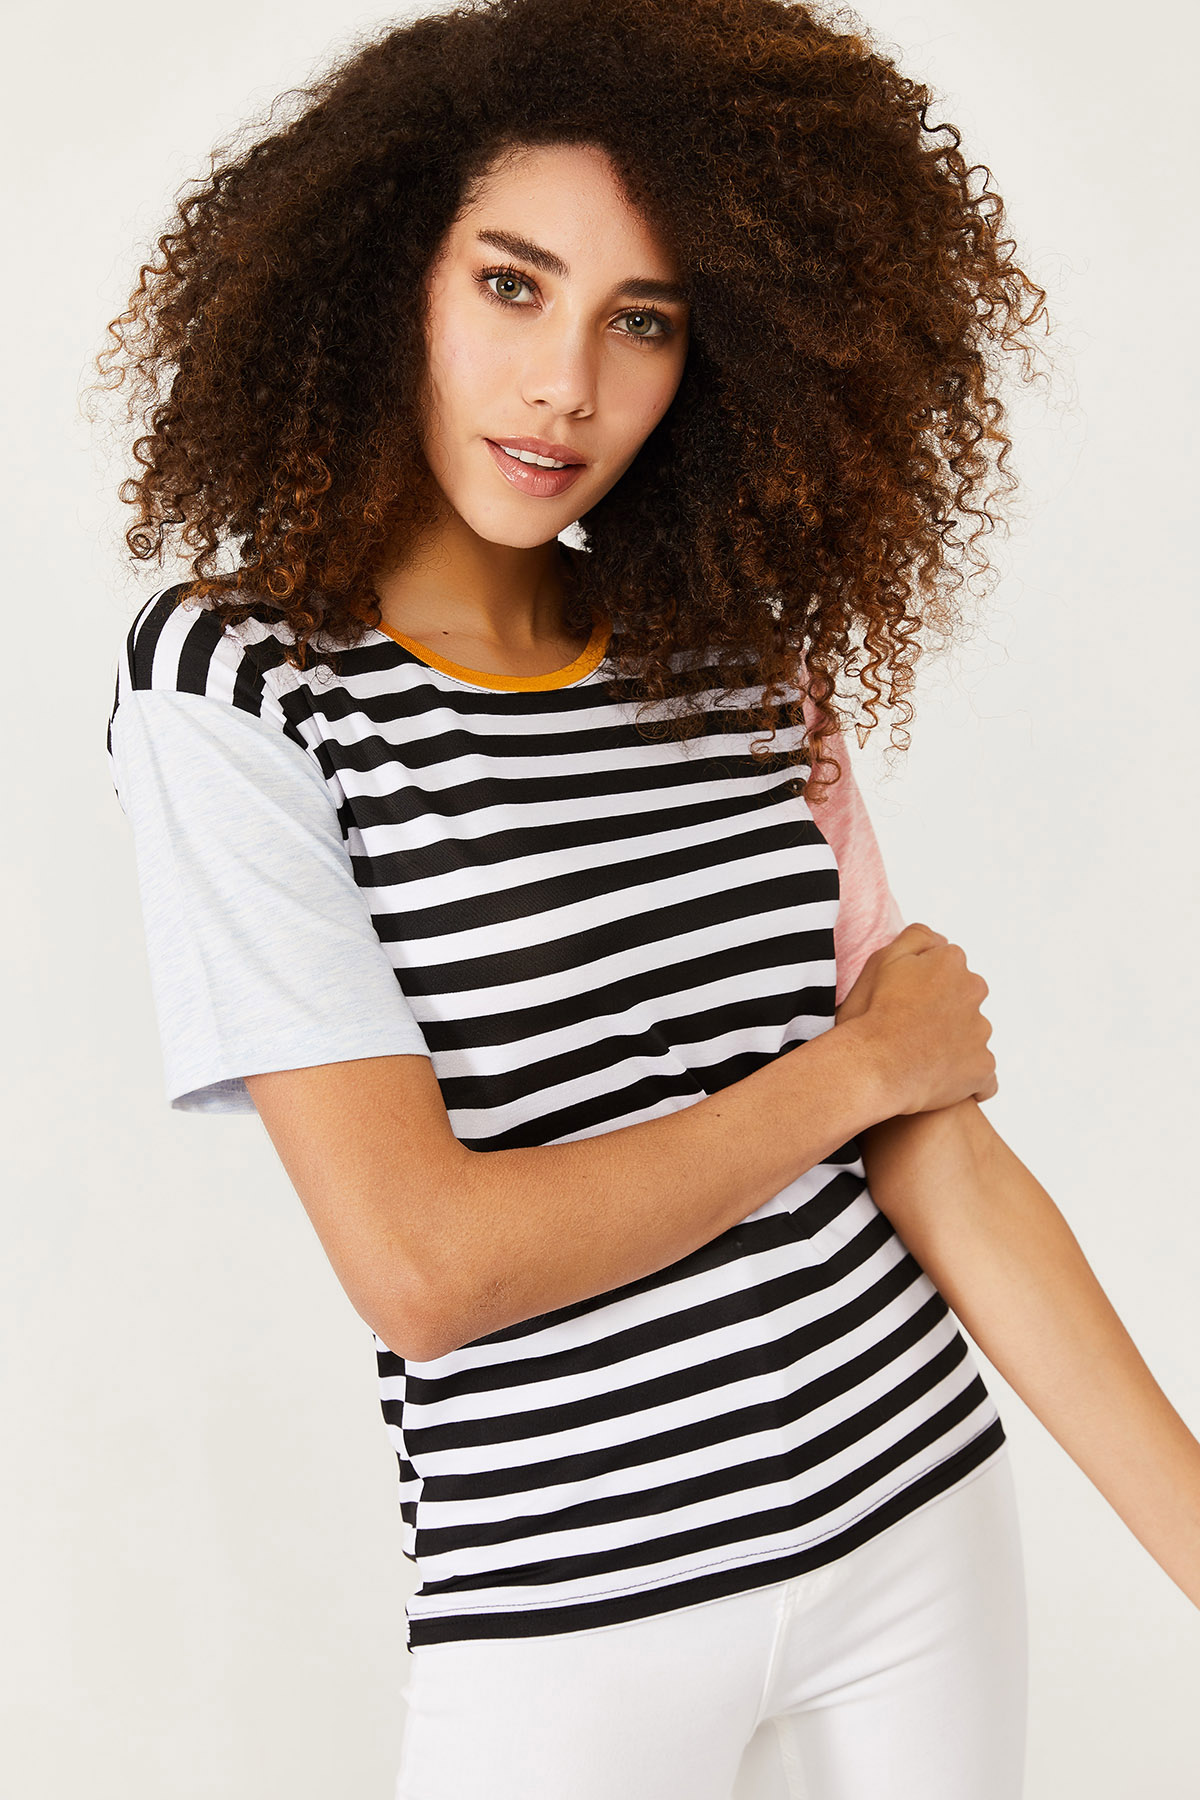 XHAN - Beyaz Kolları Renkli Çizgili T-Shirt 1KXK1-44543-01